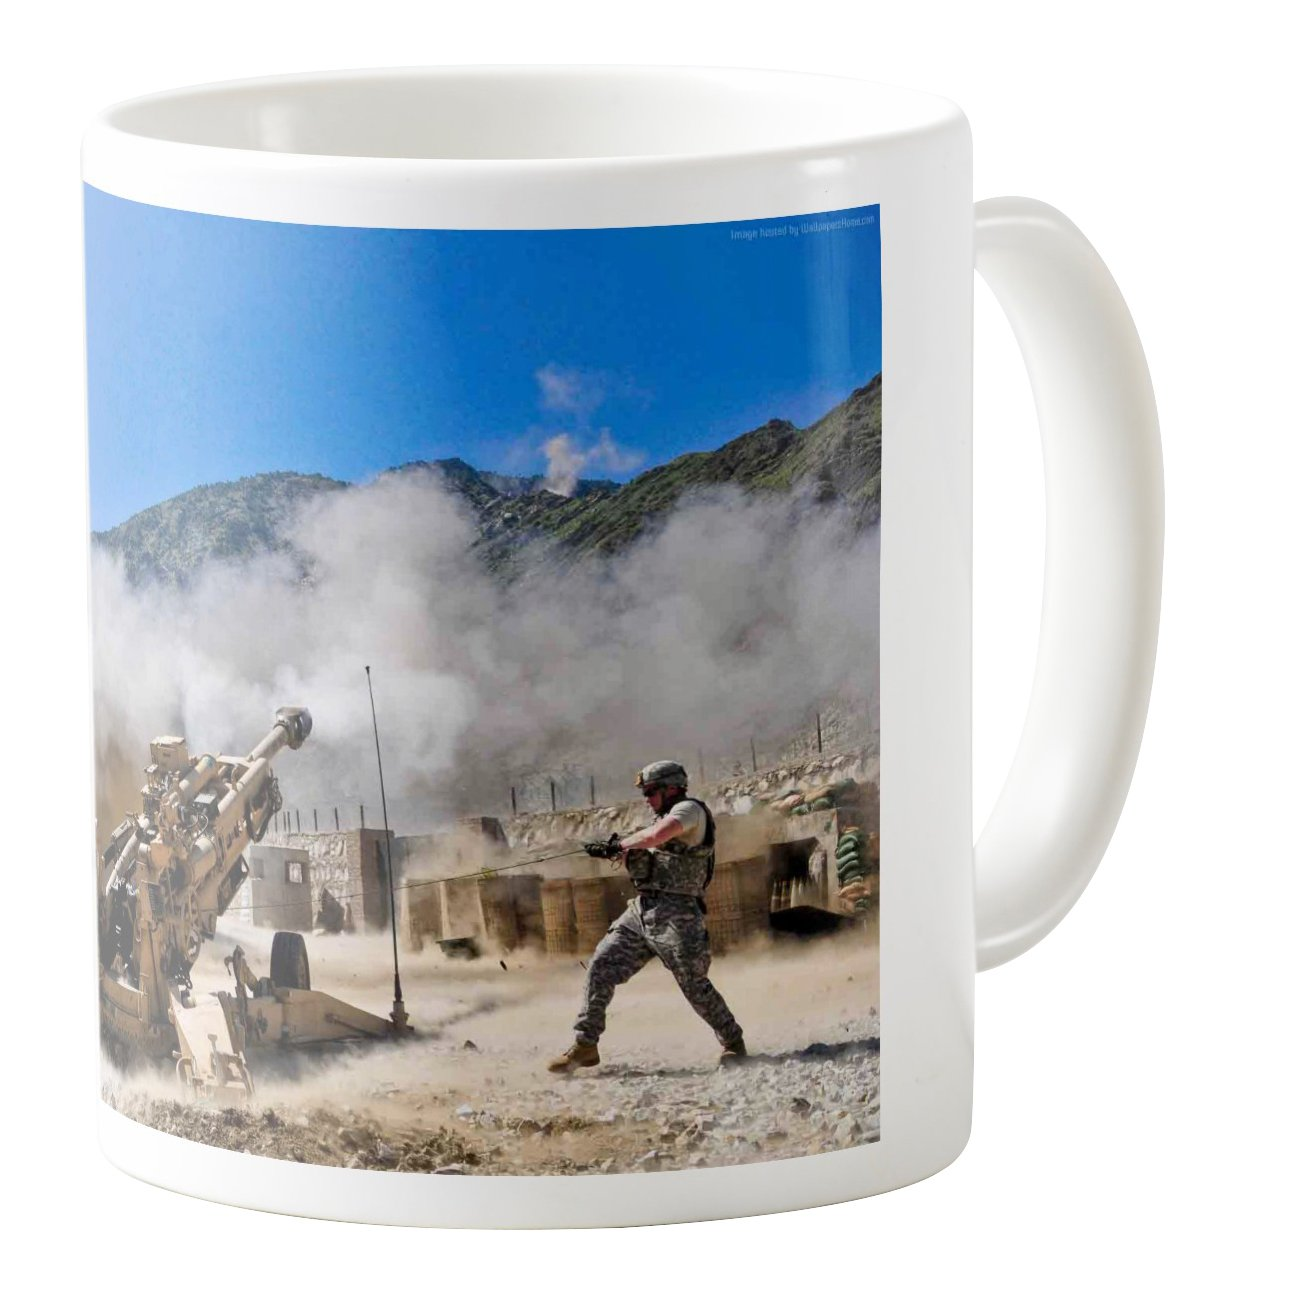 AquaSakura 11oz Ceramic Coffee Mug Tea Cup Artillery Us Army